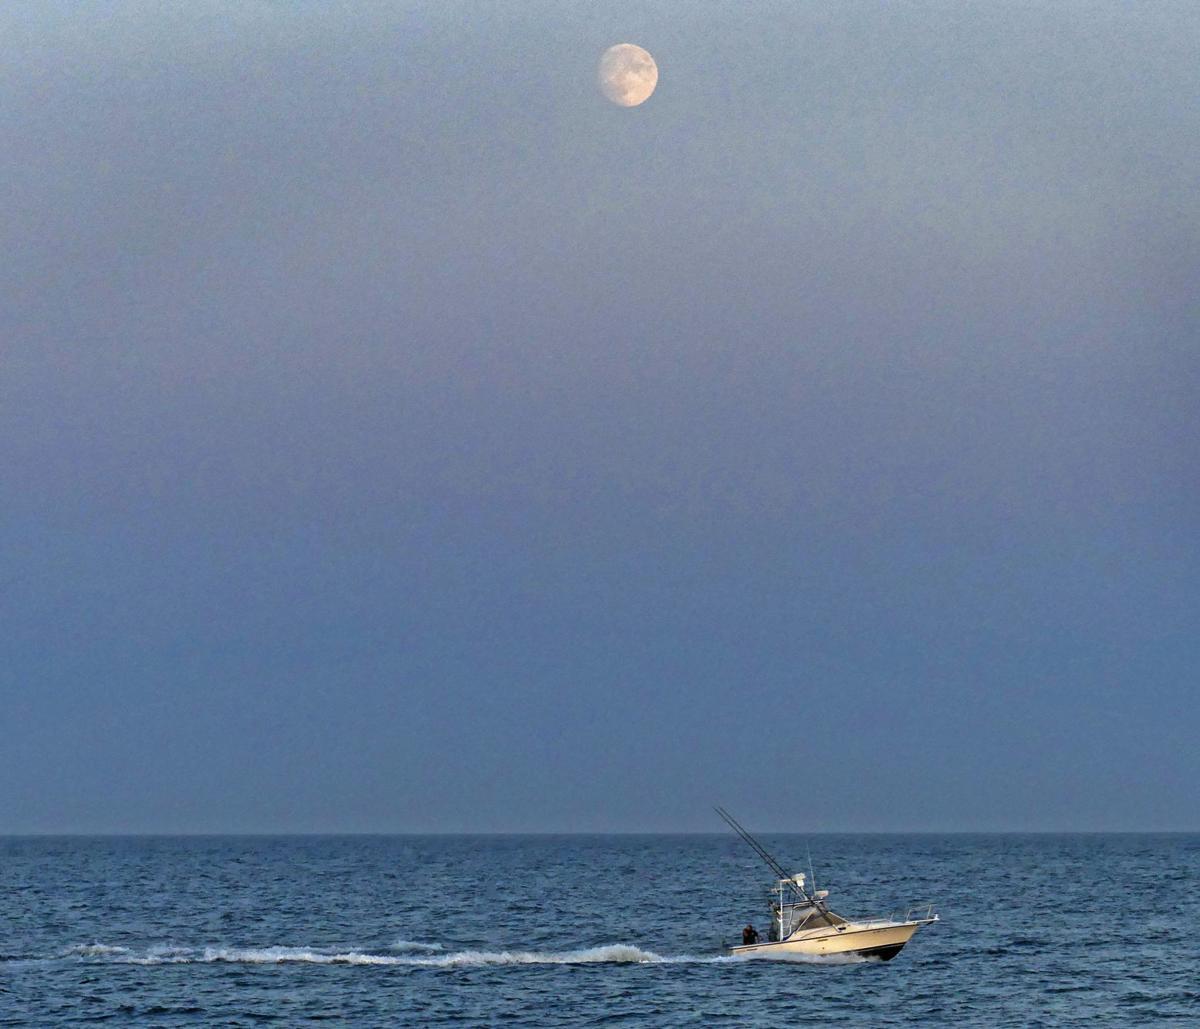 091219 WES Fishing boat and moonrise 69.JPG